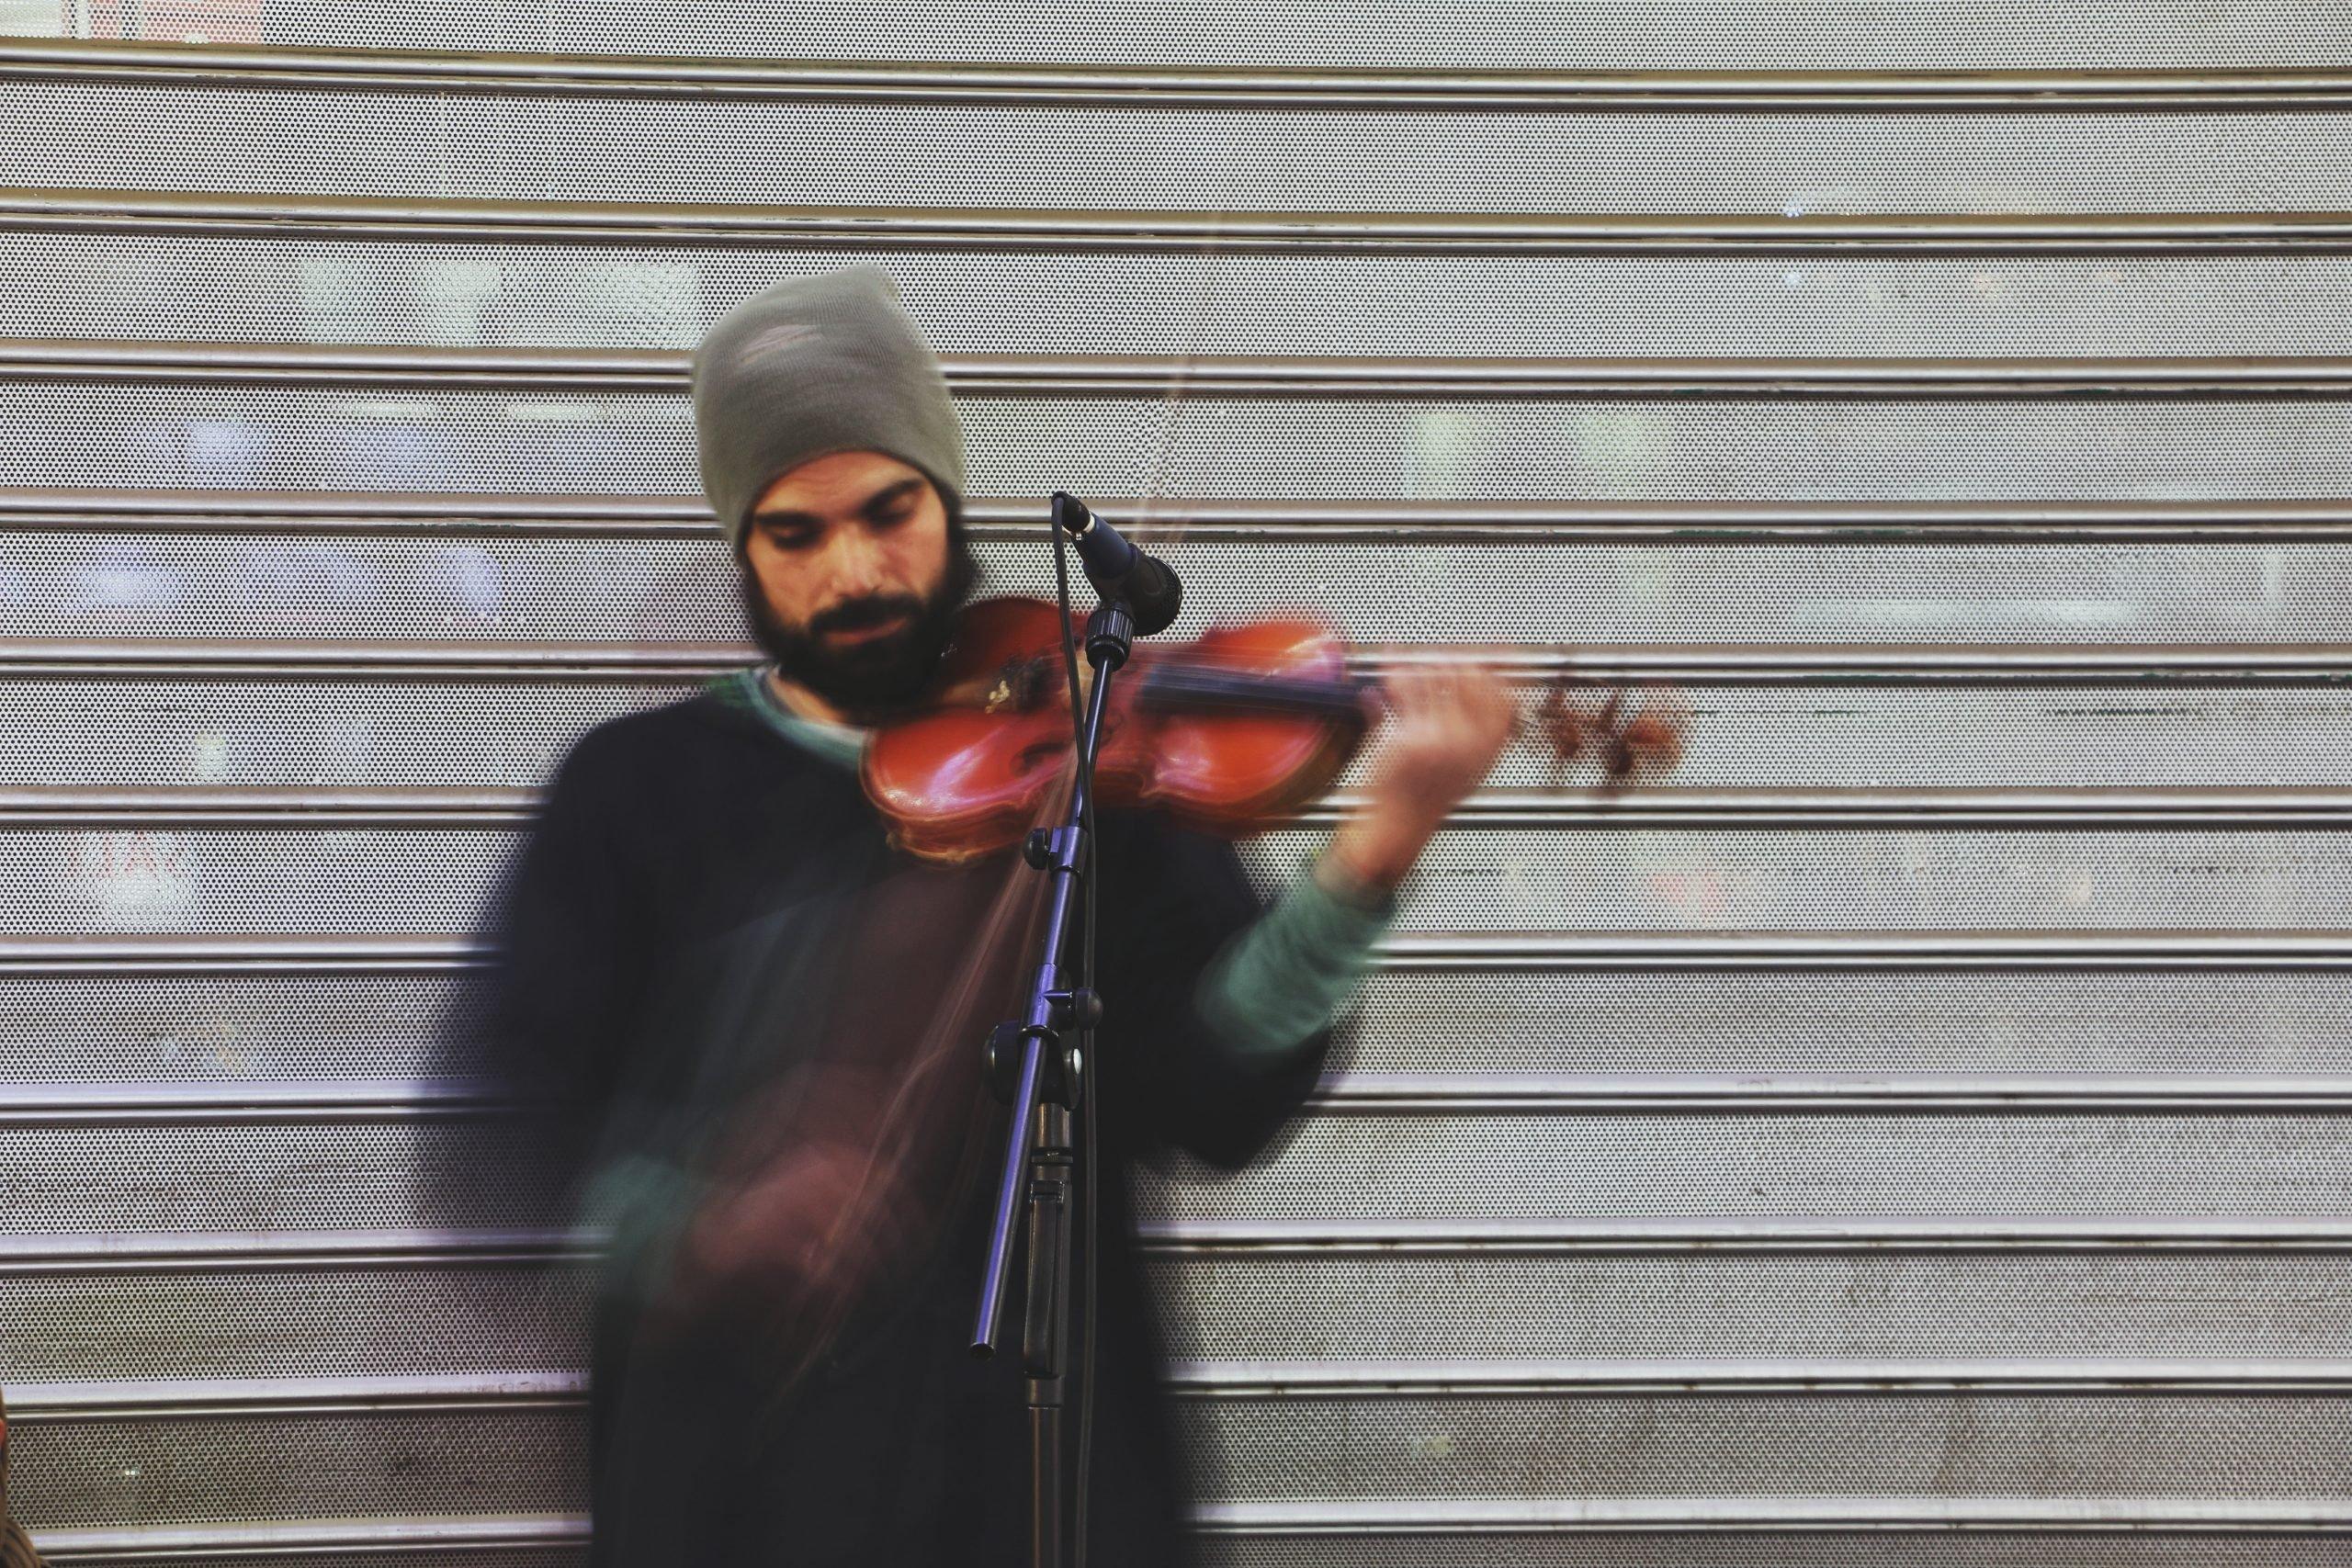 moof jongen viool spelend